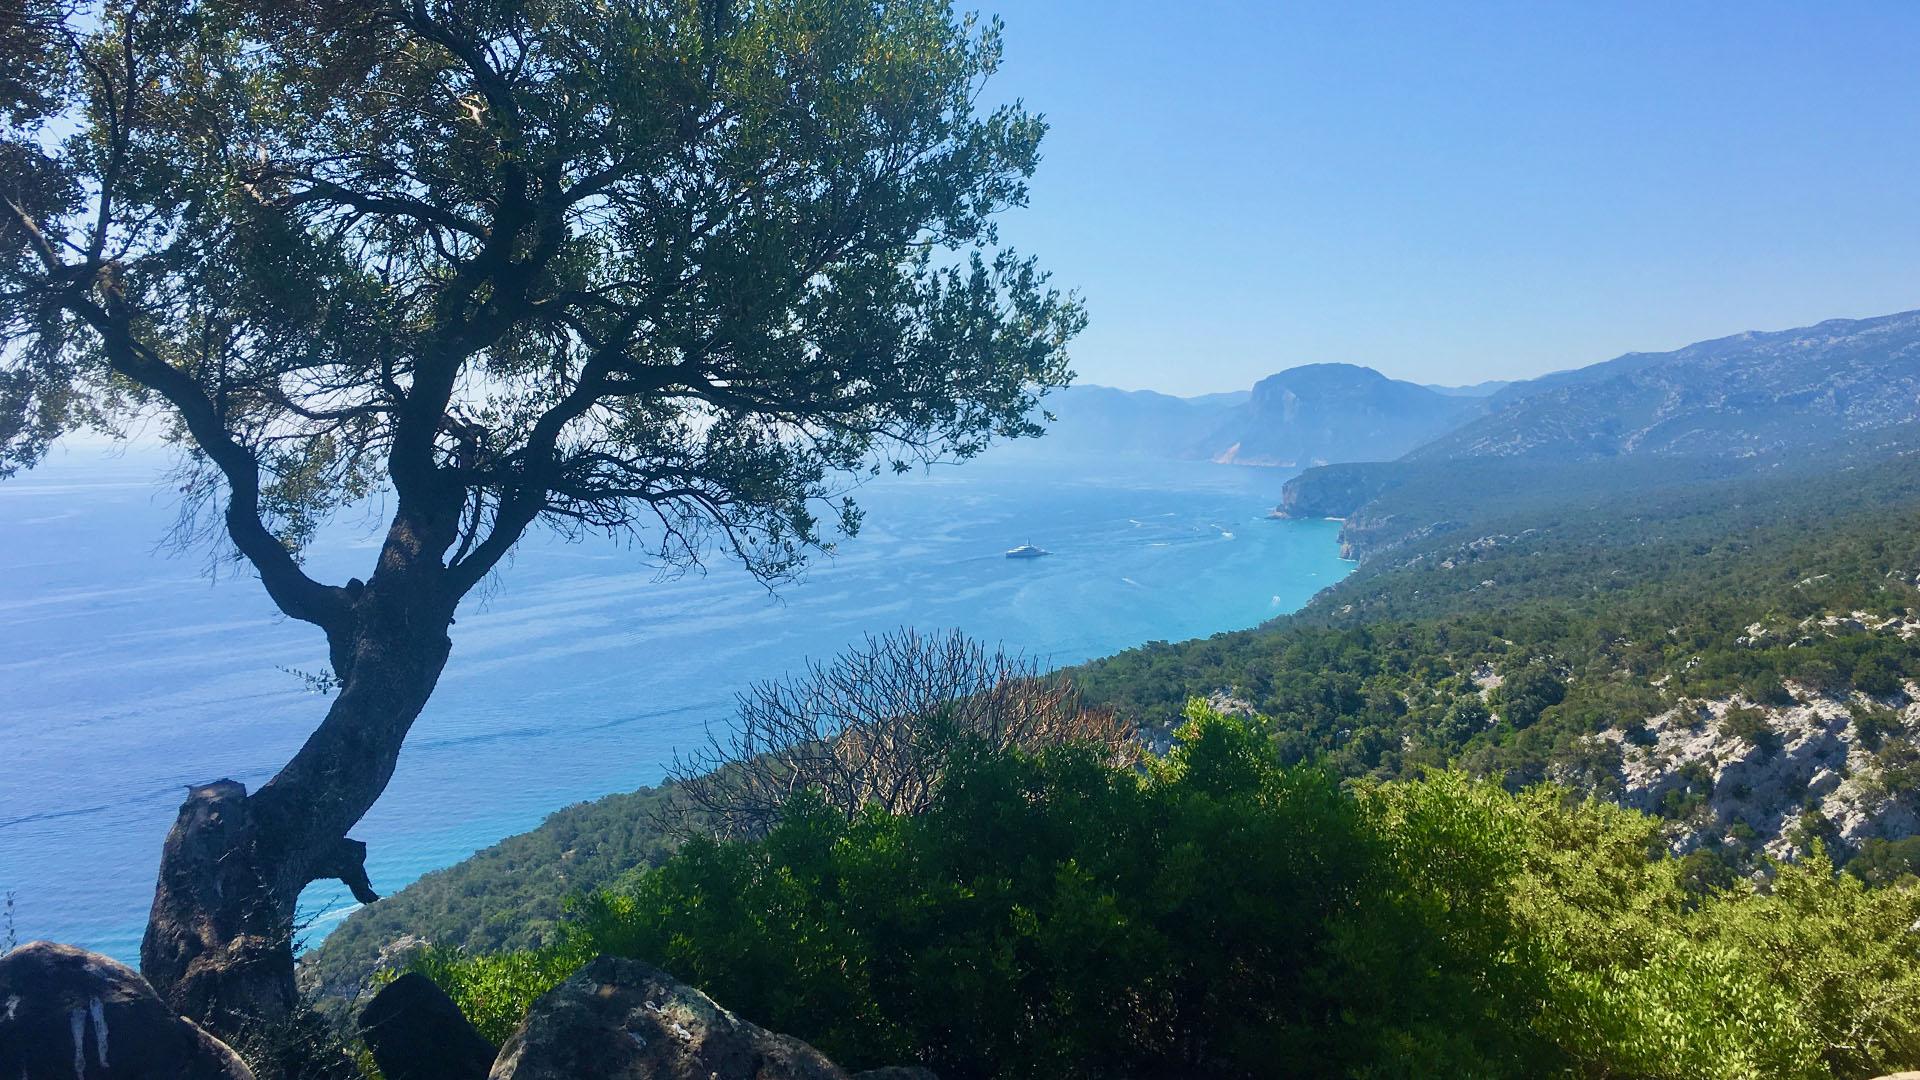 Sardinien Reise | Reisebüro Hückelhoven